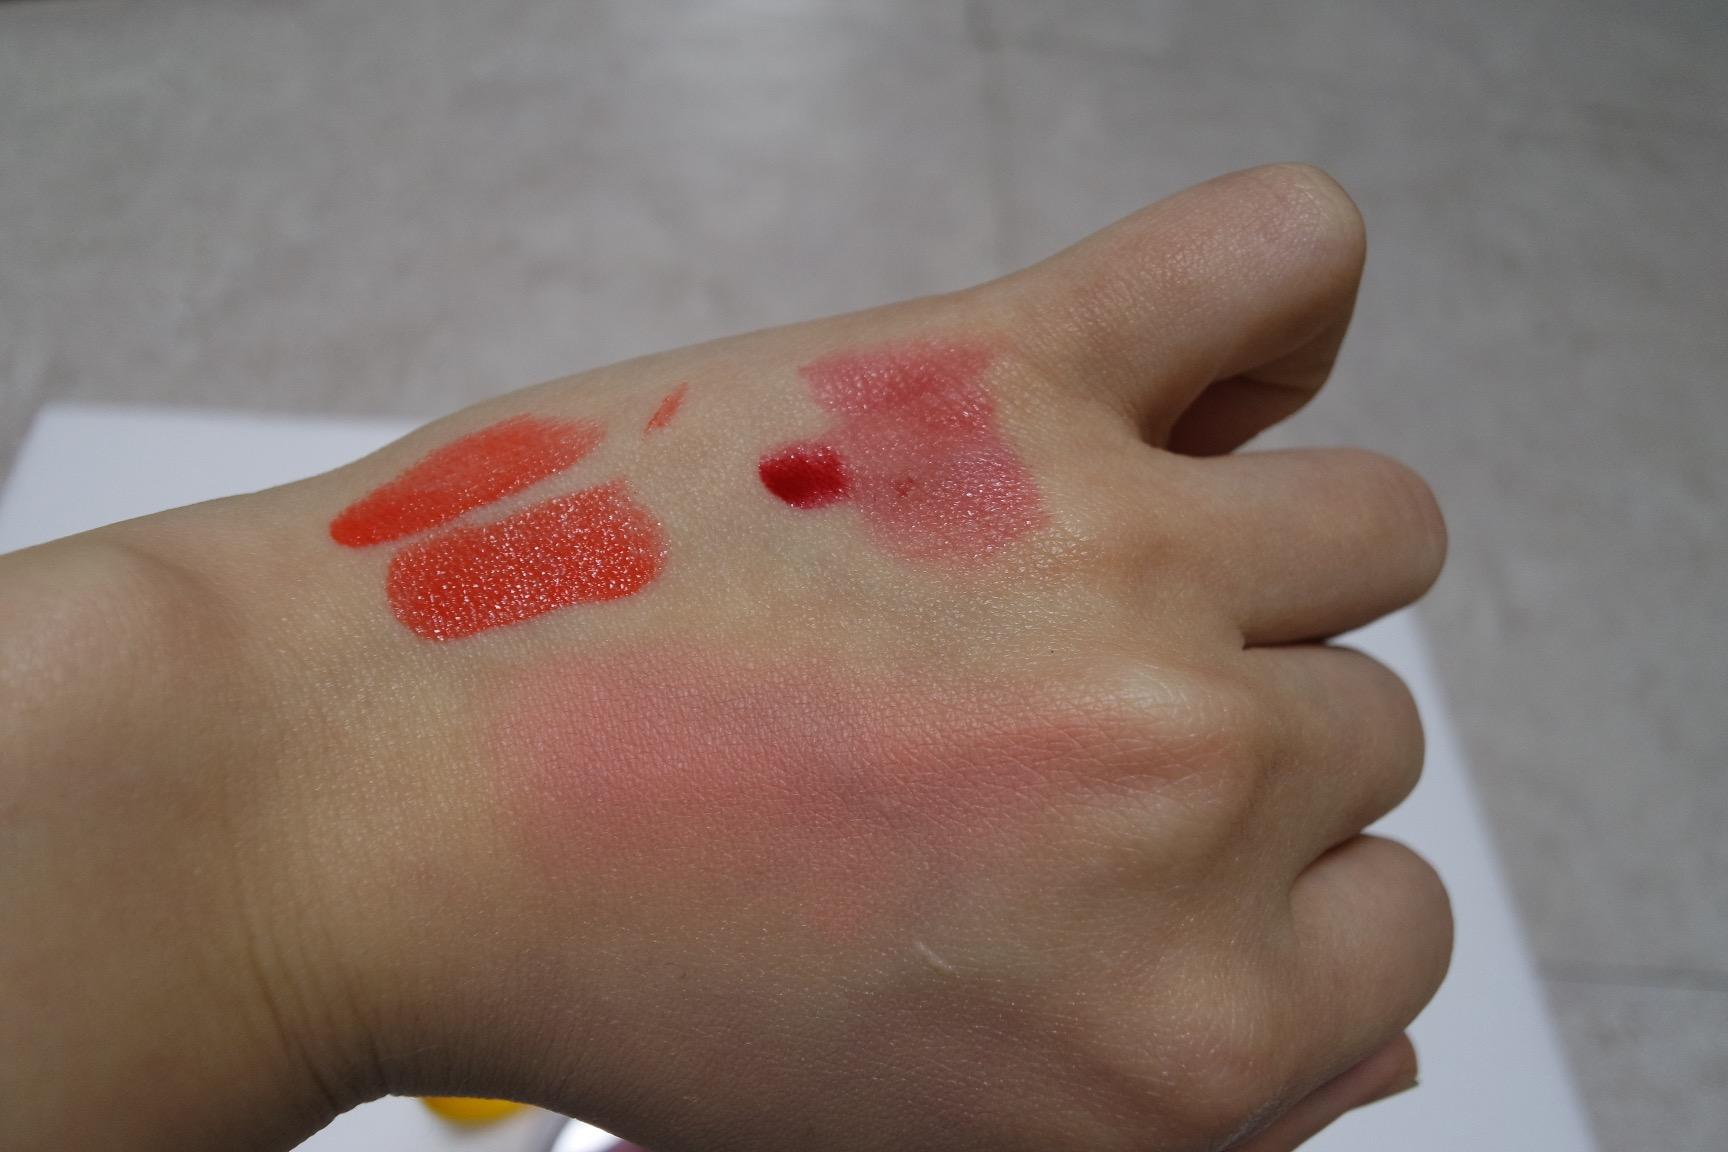 Swatches: TL - Gudetama Melting Lip Button OR02 in one swipe (top) and three swipes (bottom), TR - Gudetama All Night Tint #1 Red Queen, B - Gudetama Jelly Dough Blusher CR01